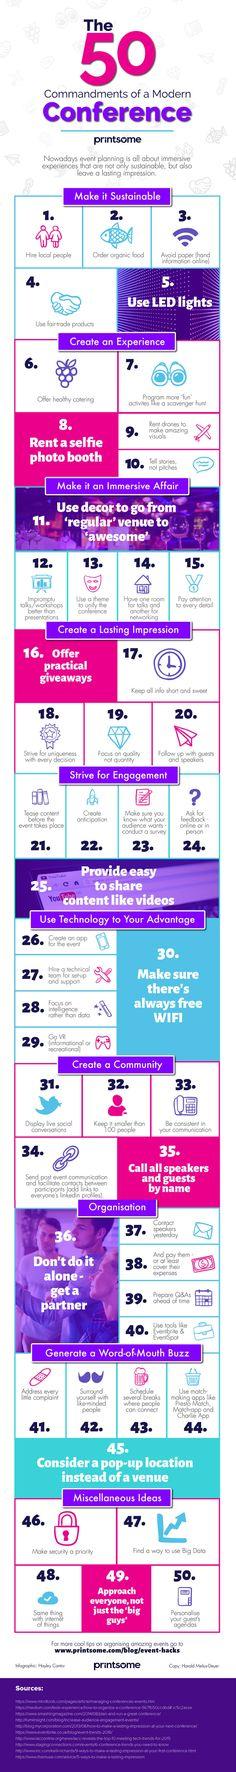 51 best Tips for Event Management images on Pinterest Event